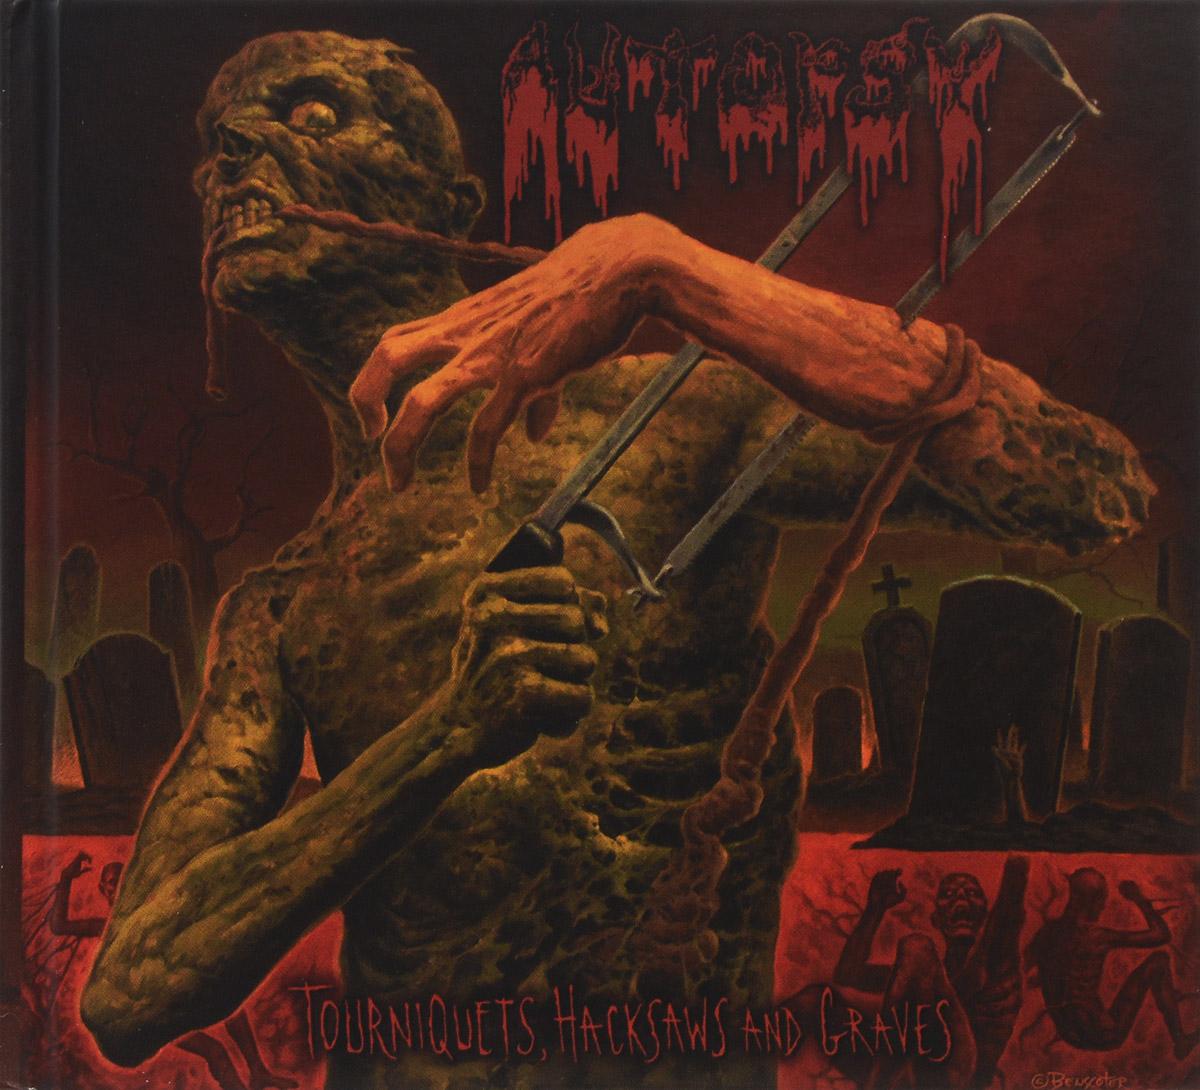 Autopsy Autopsy. Tourniquets, Hacksaws And Graves autopsy autopsy tourniquets hacksaws and graves